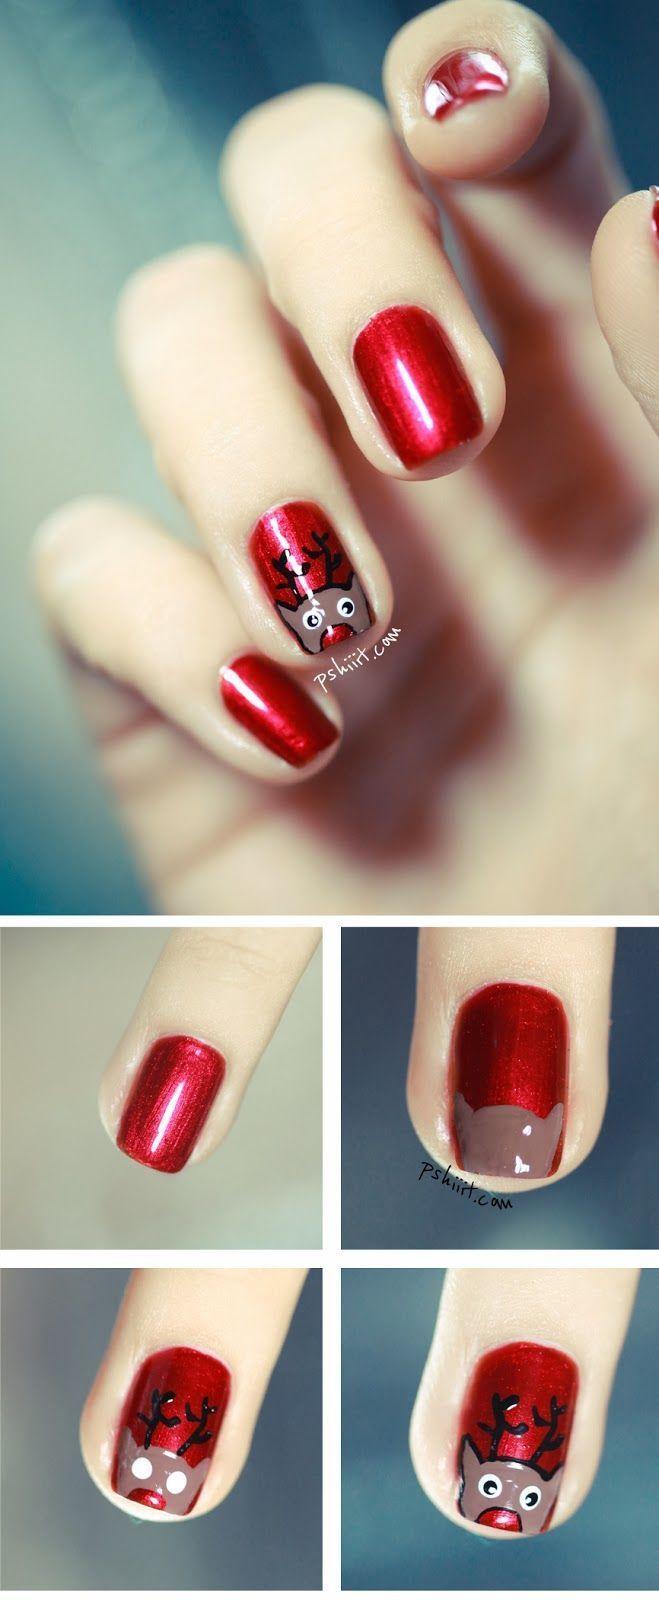 Silvester benutzerdefinierte Nail Art Ideen! – Buse – #Art #benutzerdefinierte …